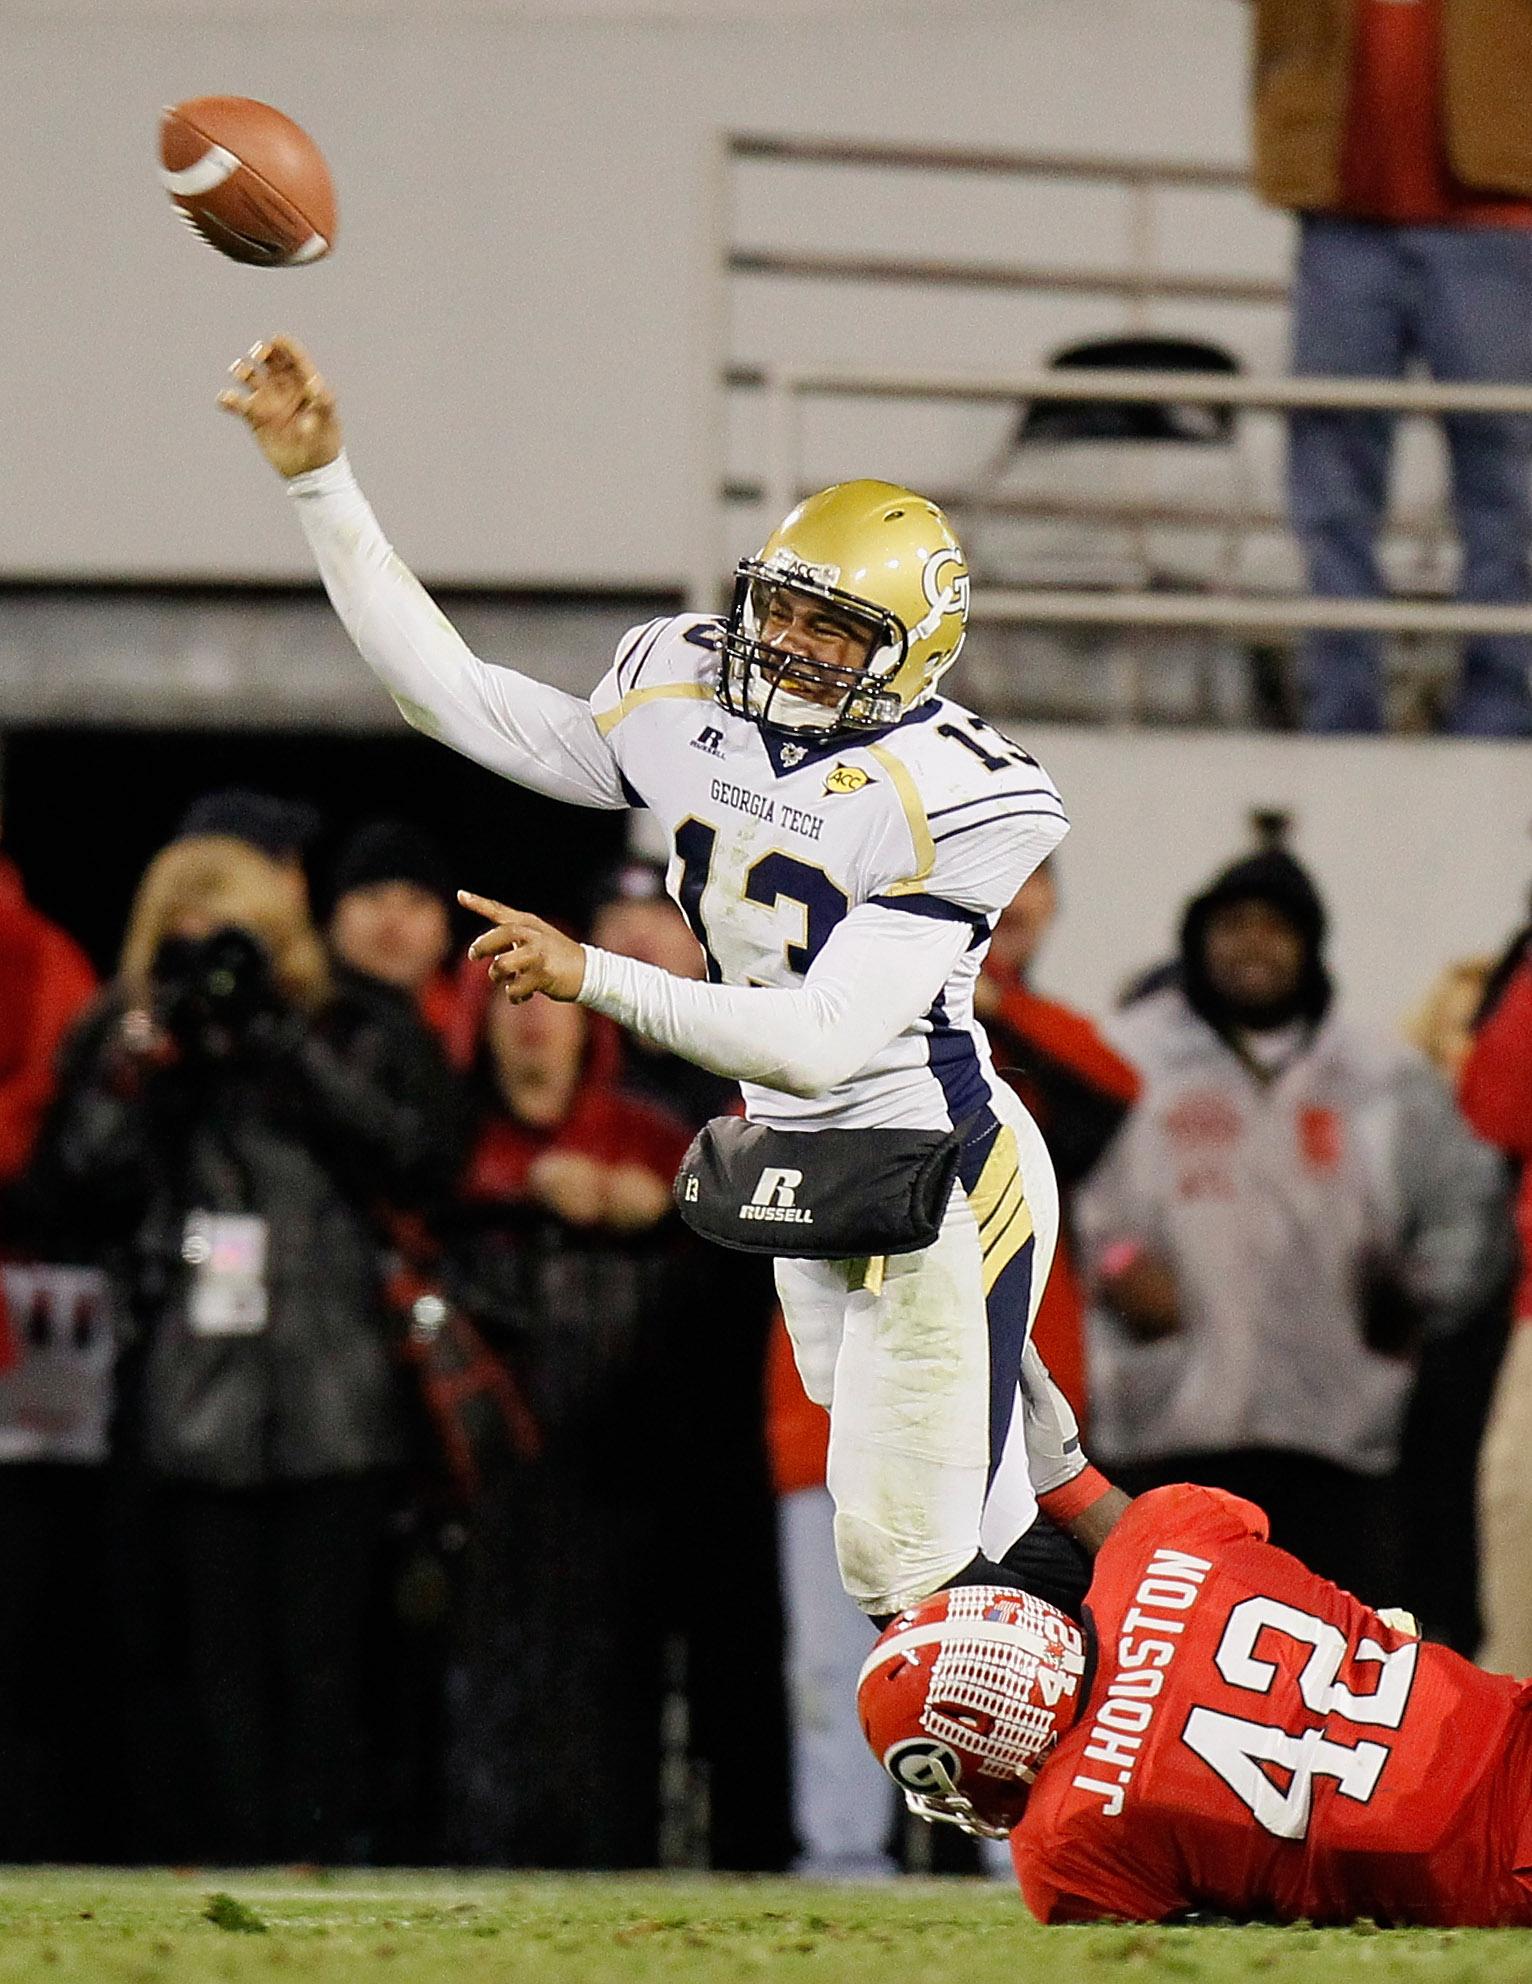 ATHENS, GA - NOVEMBER 27:  Justin Houston #42 of the Georgia Bulldogs pressures quarterback Tevin Washington #13 of the Georgia Tech Yellow Jackets at Sanford Stadium on November 27, 2010 in Athens, Georgia.  (Photo by Kevin C. Cox/Getty Images)